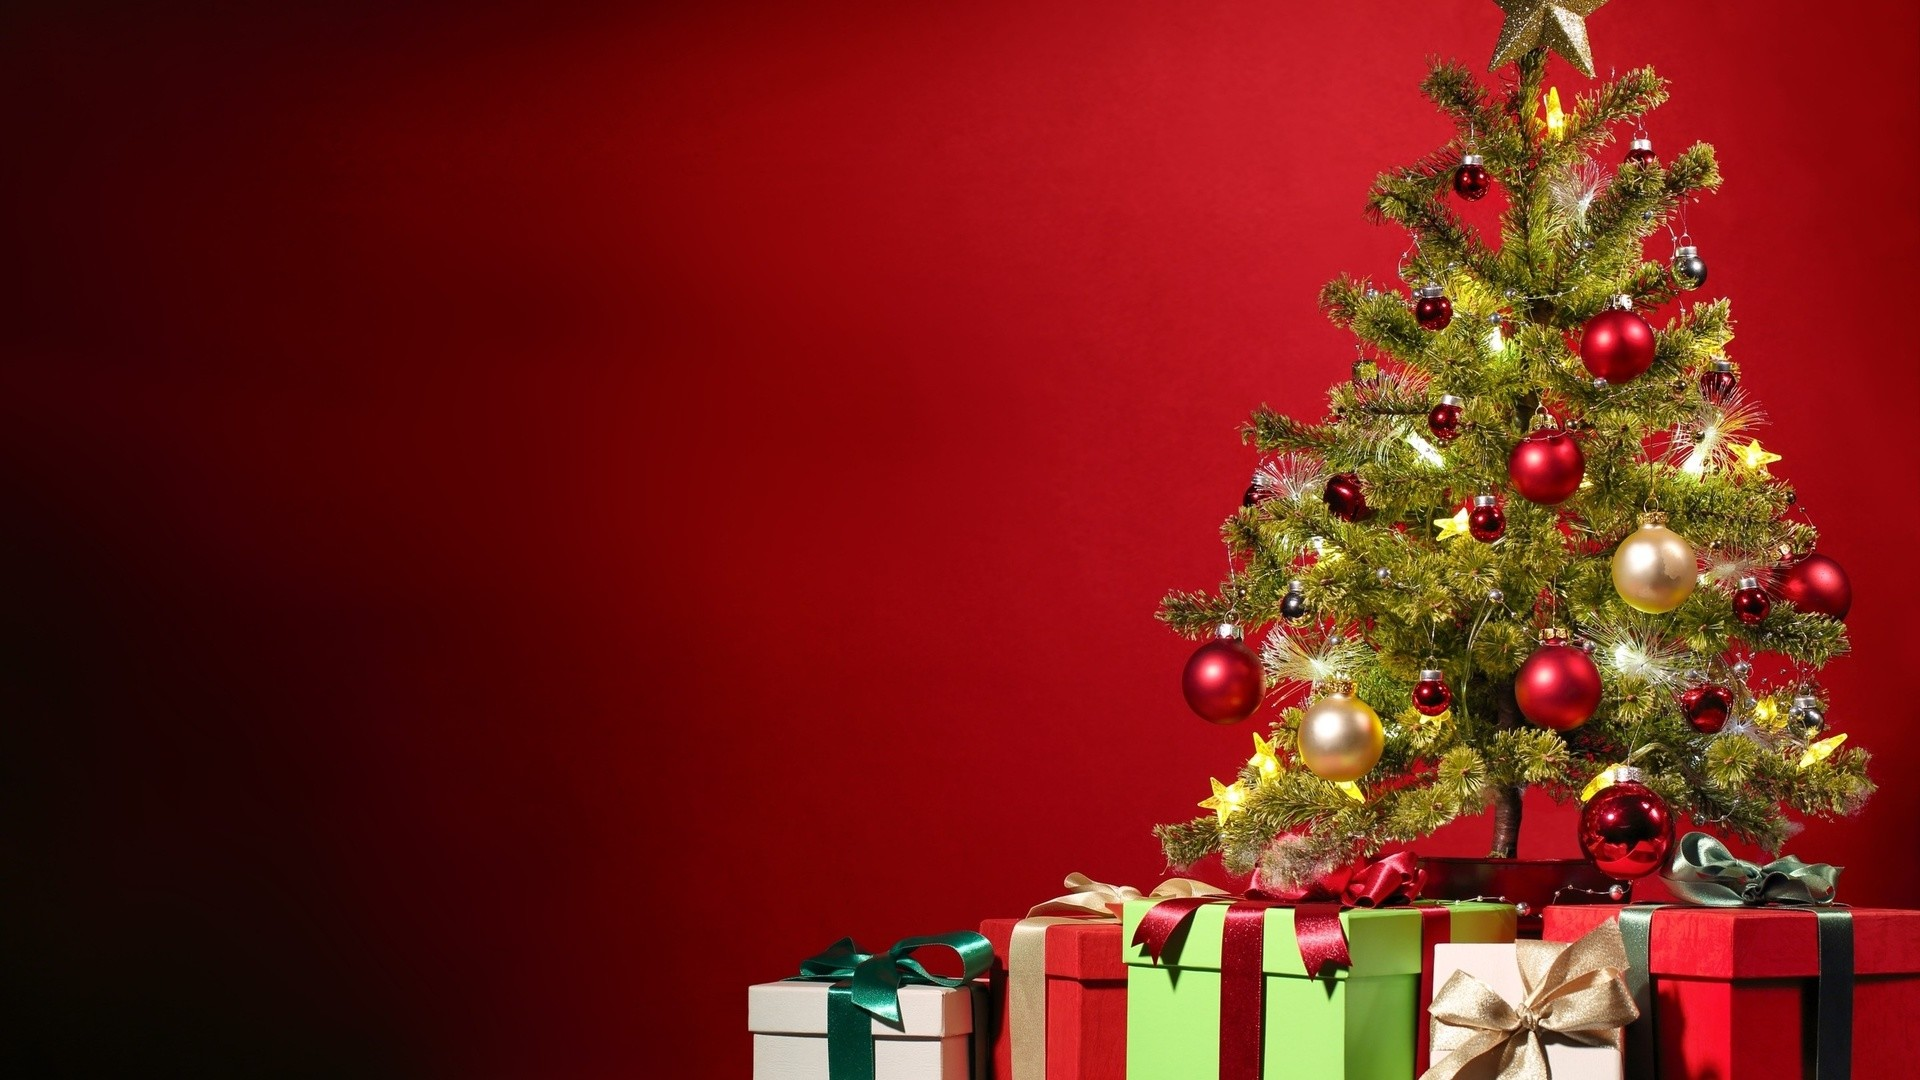 Merry Christmas Tree Wallpaper download 1920x1080